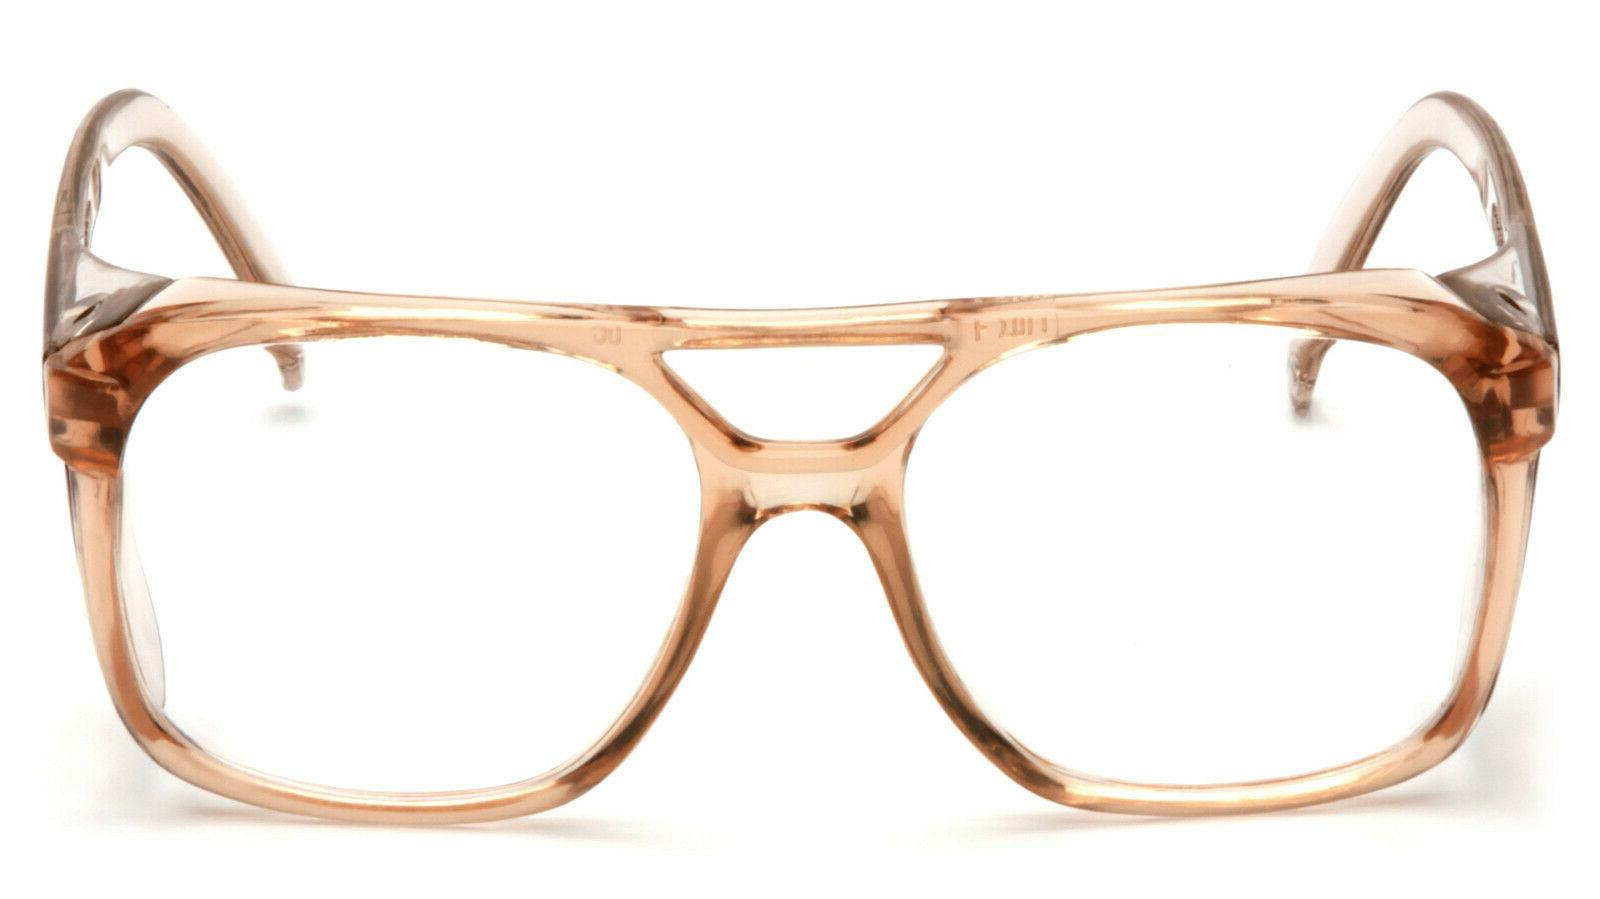 Pyramex Caramel Aviator Glasses